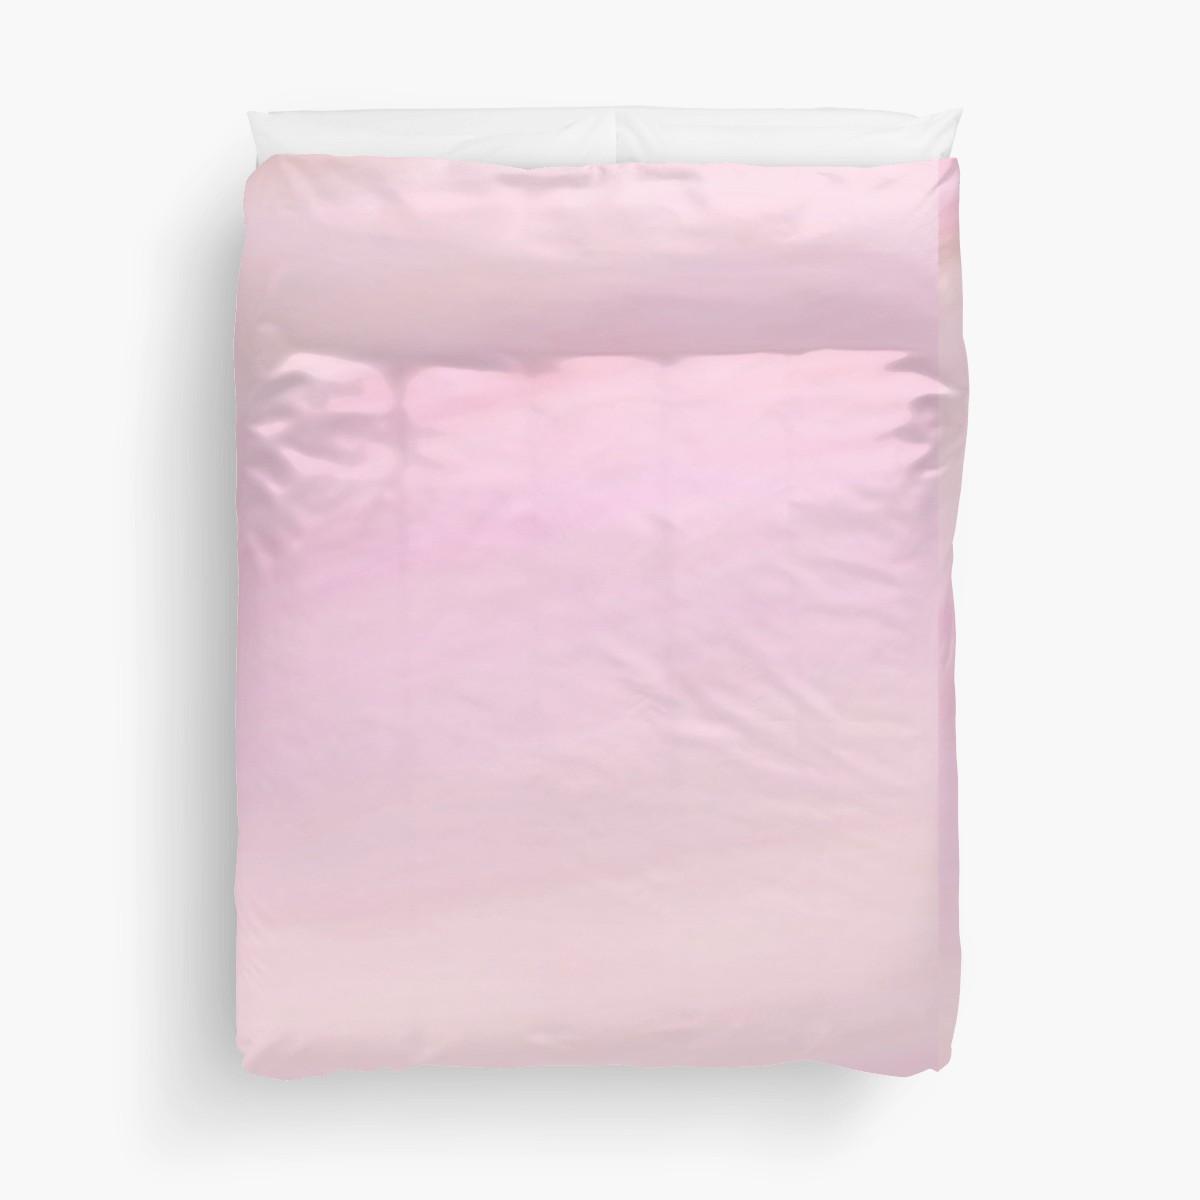 Pink Blush by Leatherwood Design a/k/a kahmier